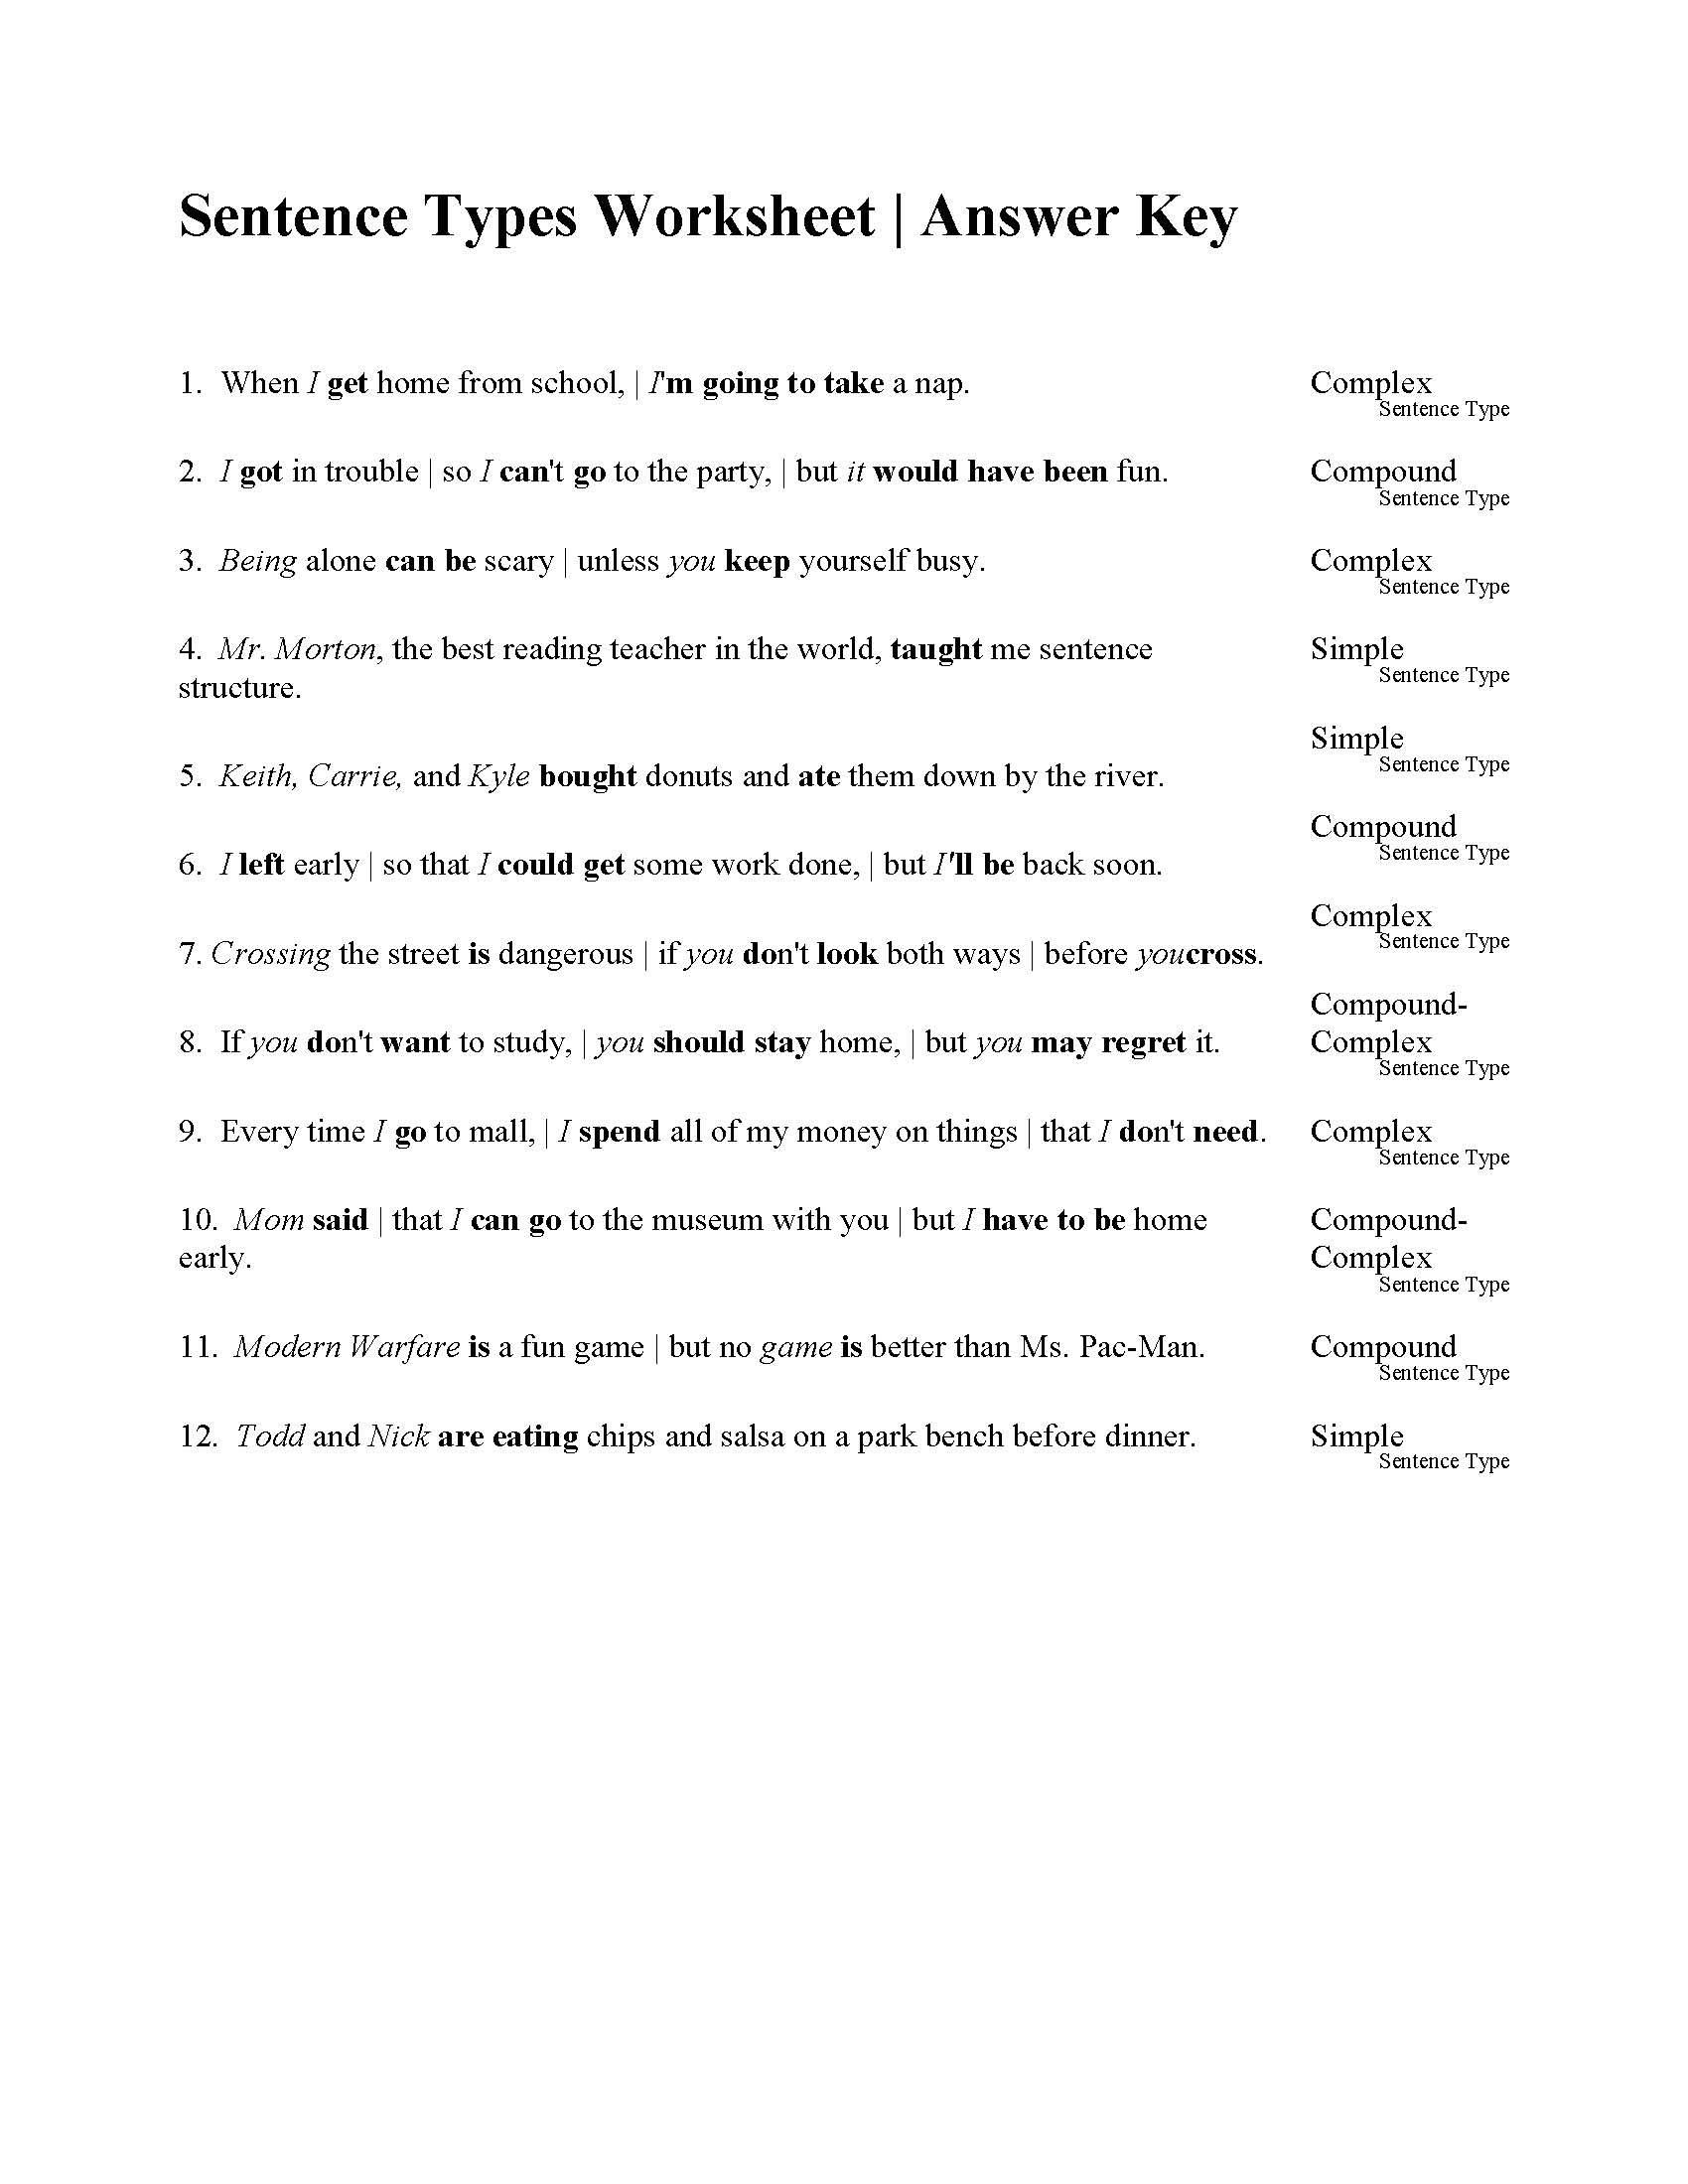 6th Grade Sentence Structure Worksheets Sentences Types Worksheet